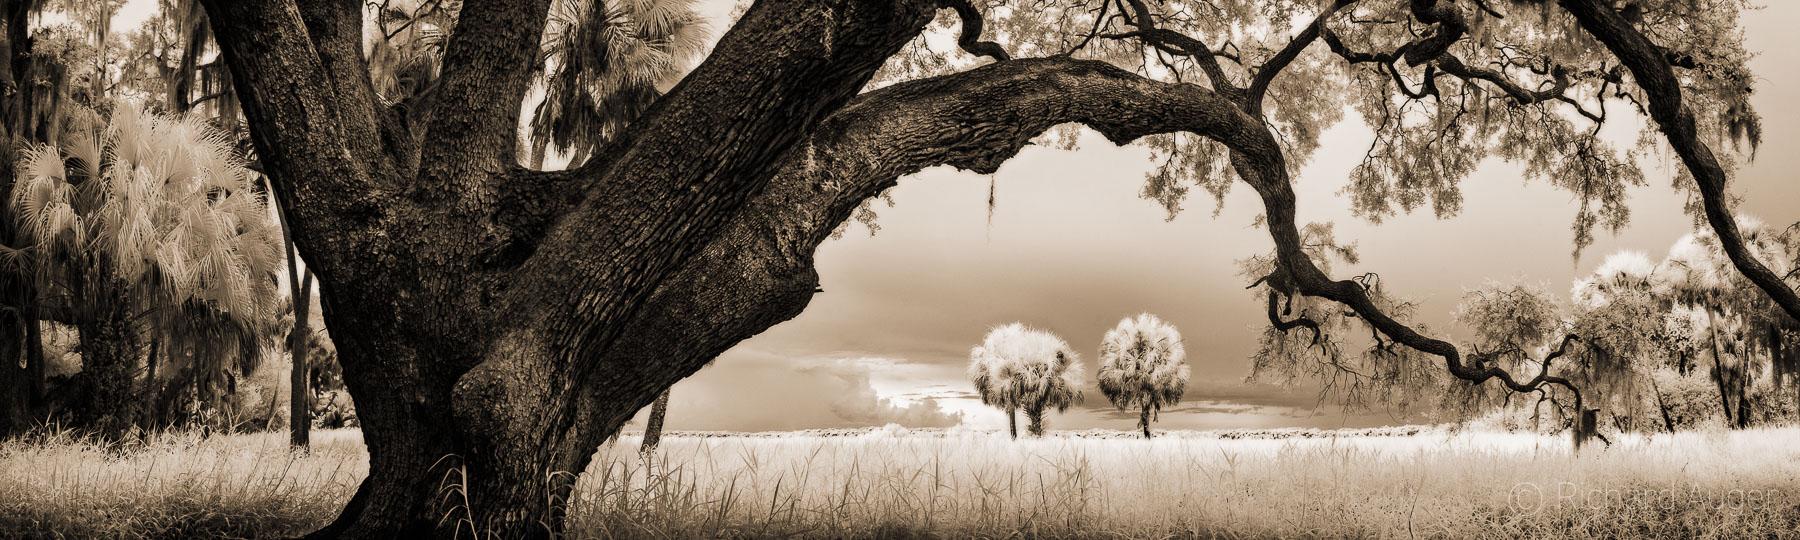 Myakka River State Park, Florida, Oak, Palm Trees, Swamp, Haunted, Sepia, Monochrome, Photograph, Nature, panorama